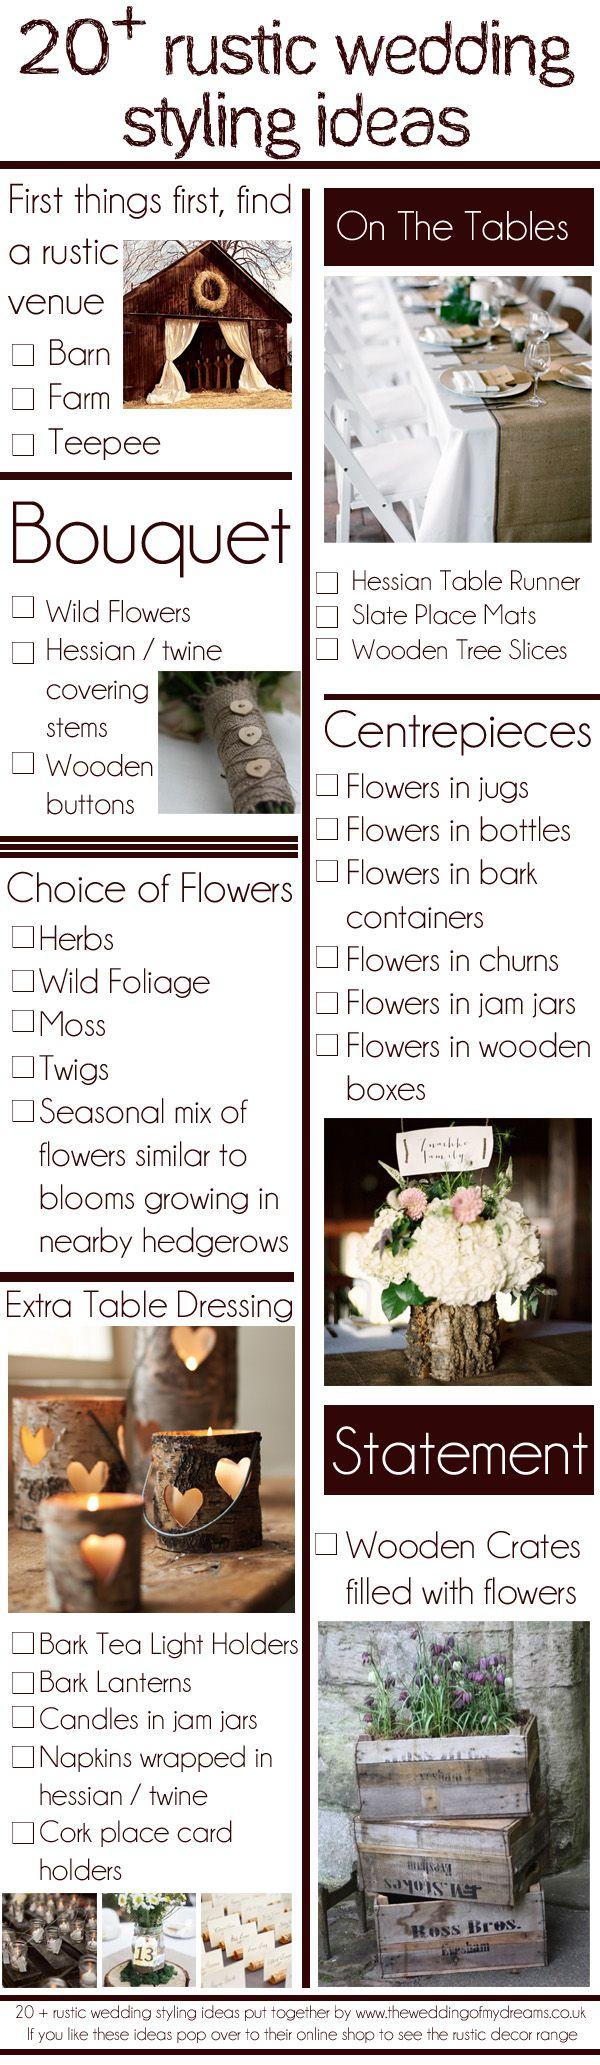 Wedding decorations list   best wedding ideas images on Pinterest  Country weddings